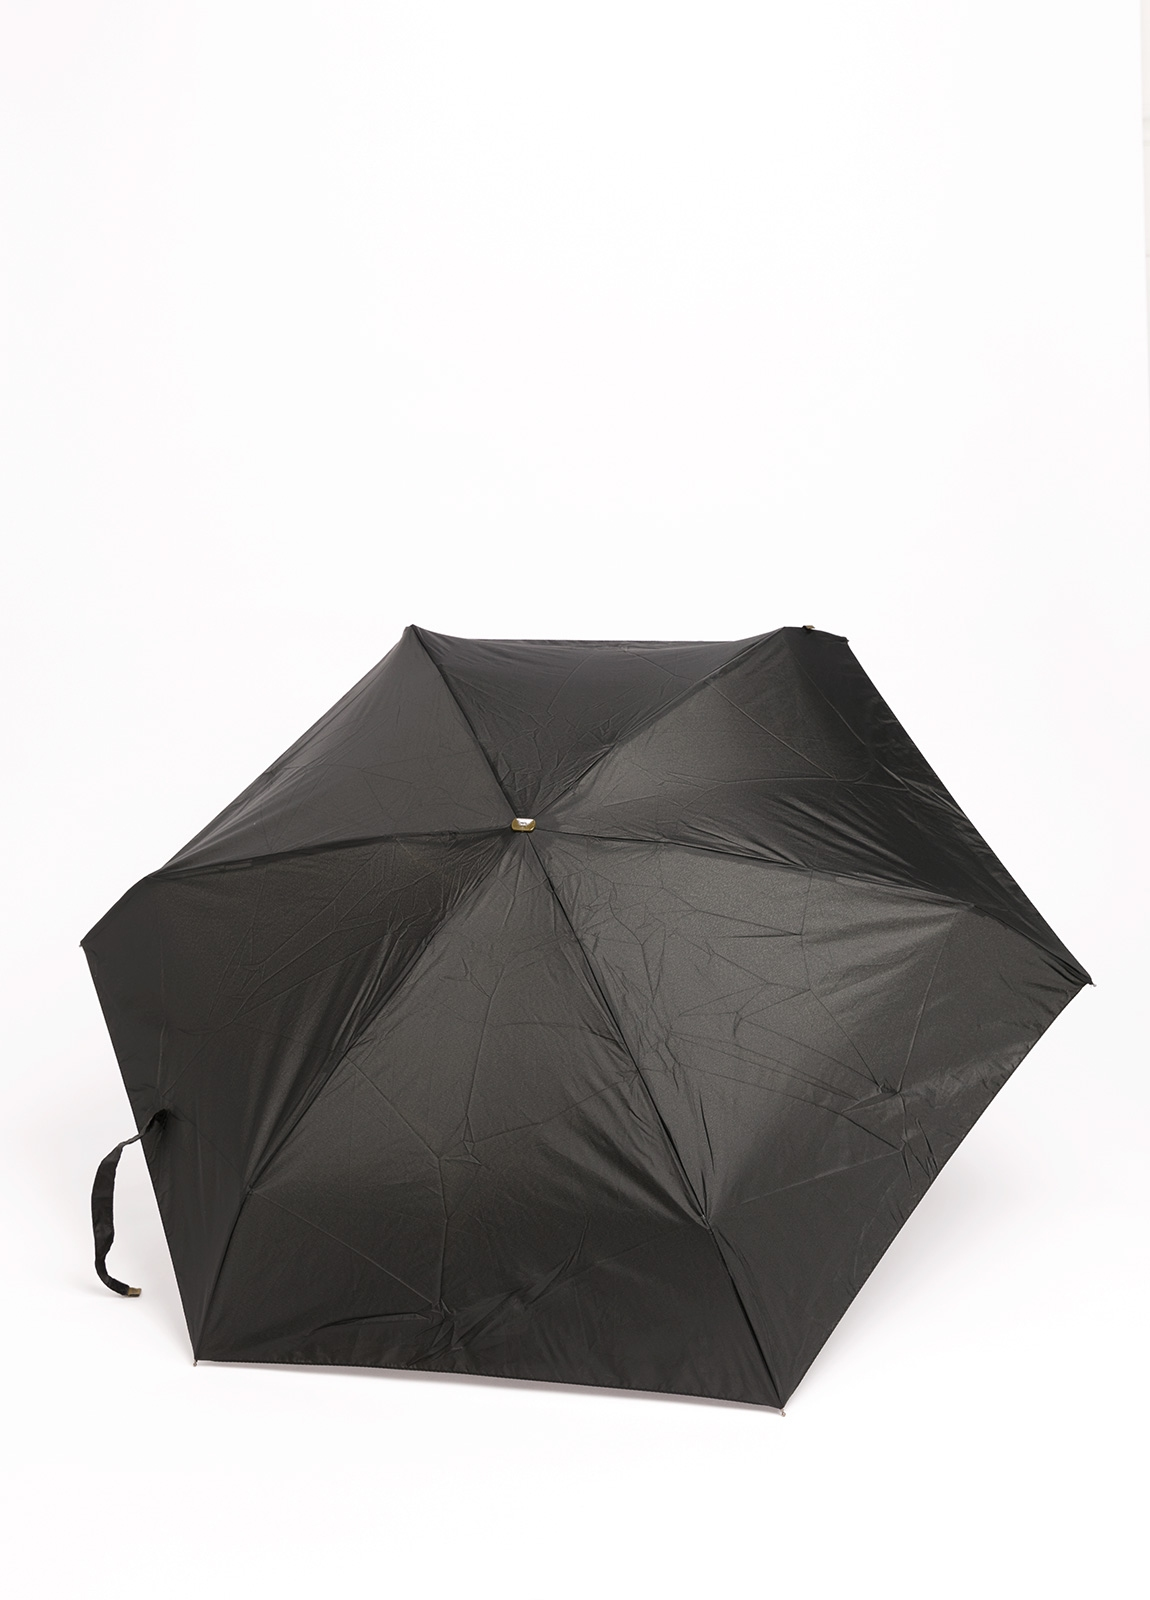 Paraguas FUREST COLECCIÓN ultra compacto negro. - Ítem2